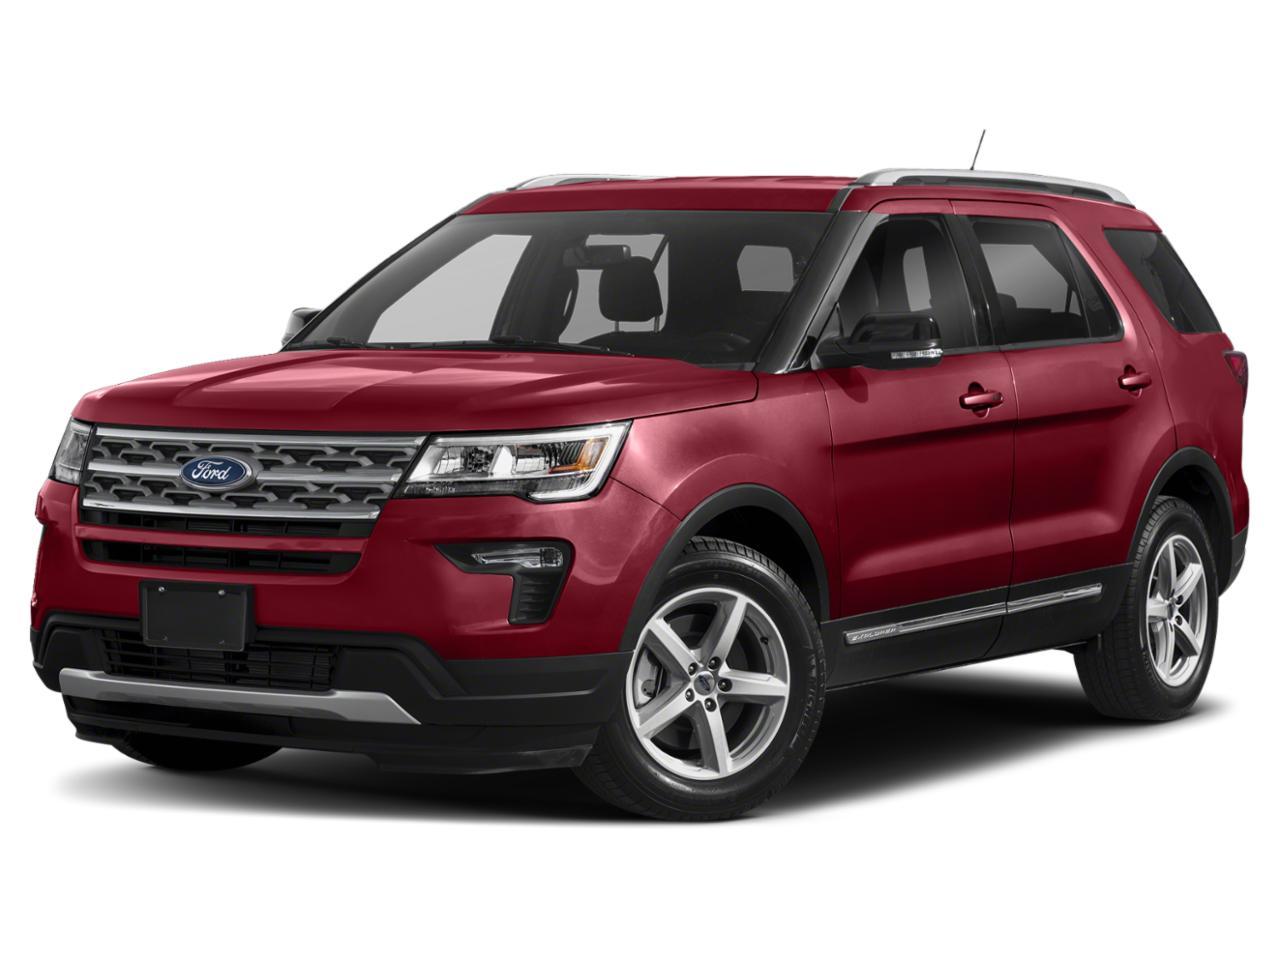 2018 Ford Explorer Vehicle Photo in TUCSON, AZ 85705-6014